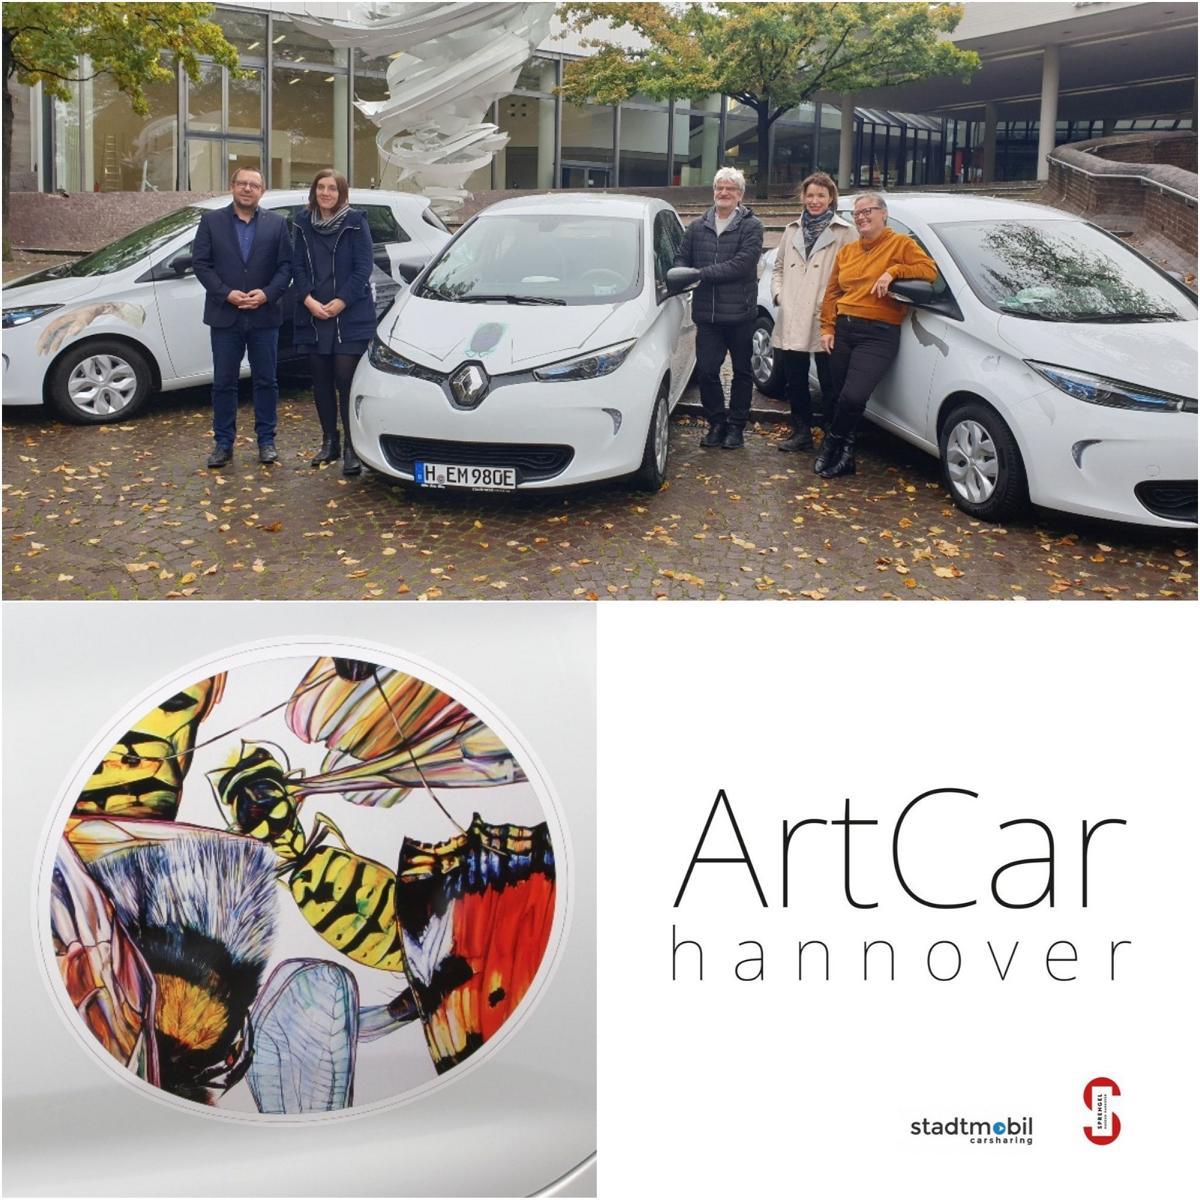 Art Car und stadtmobil - Kooperation